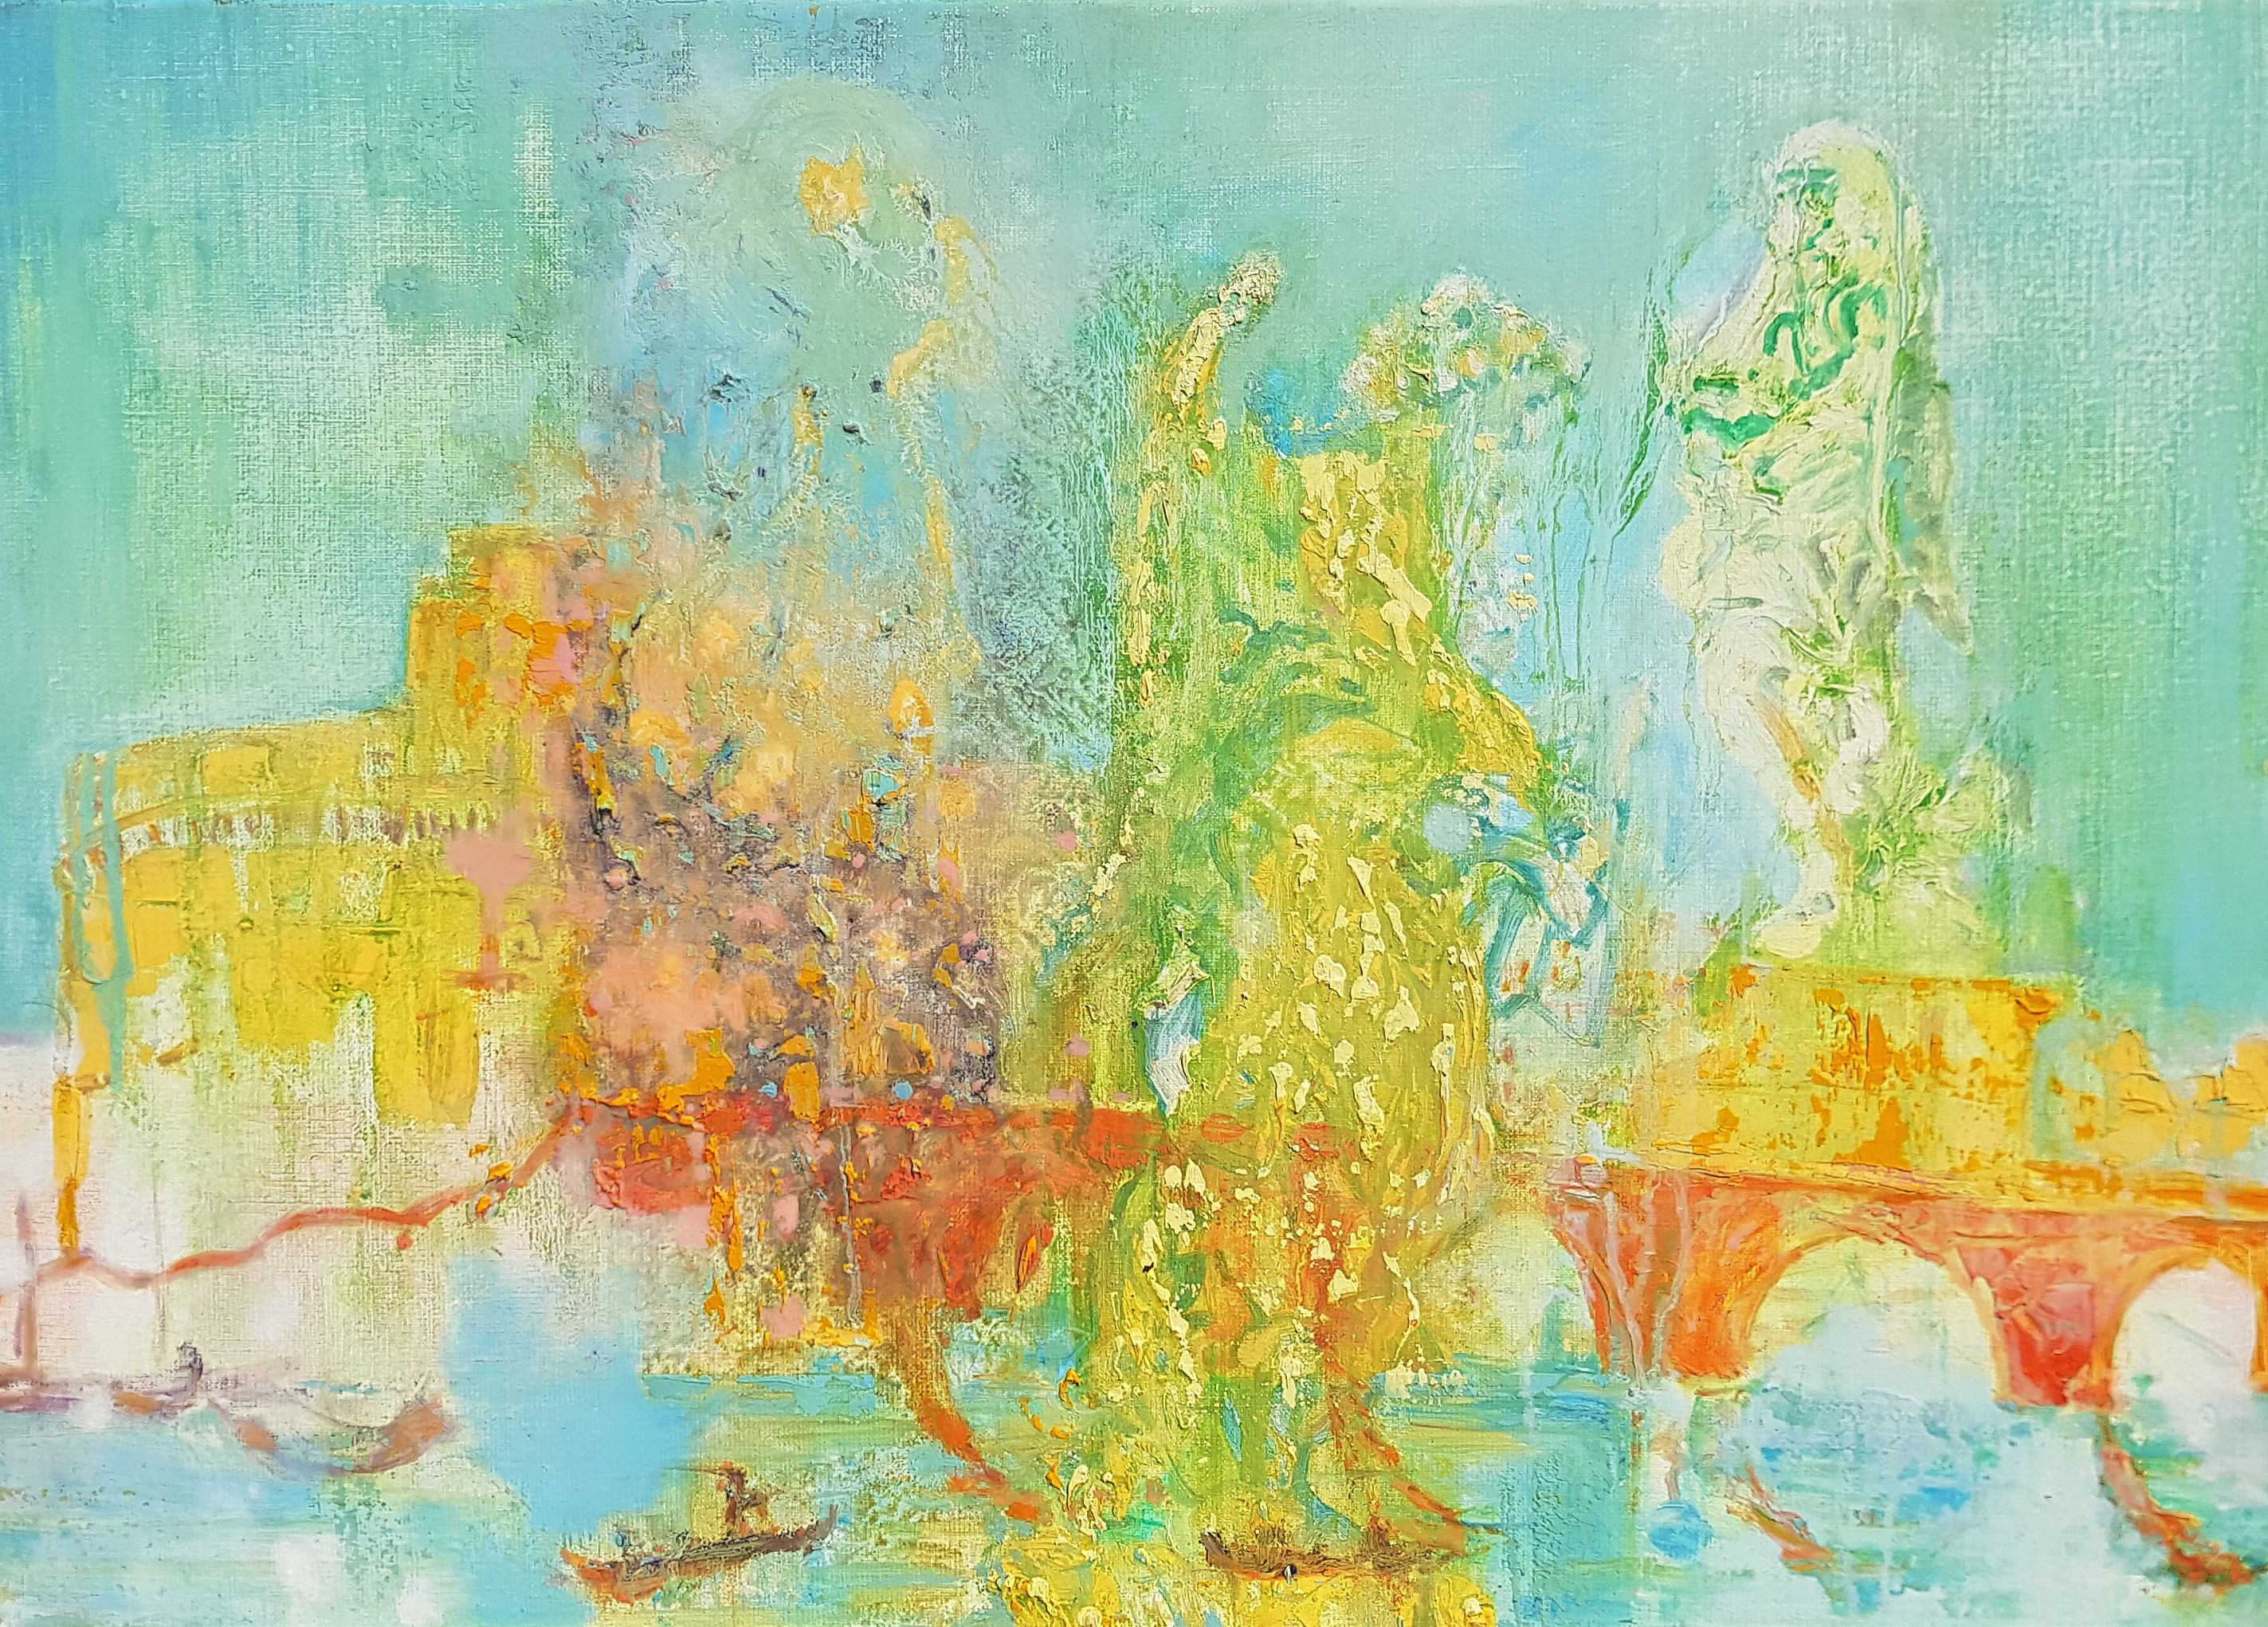 Engelenburcht, Gaspare Vanvitteli's Rome- Uwe Poth